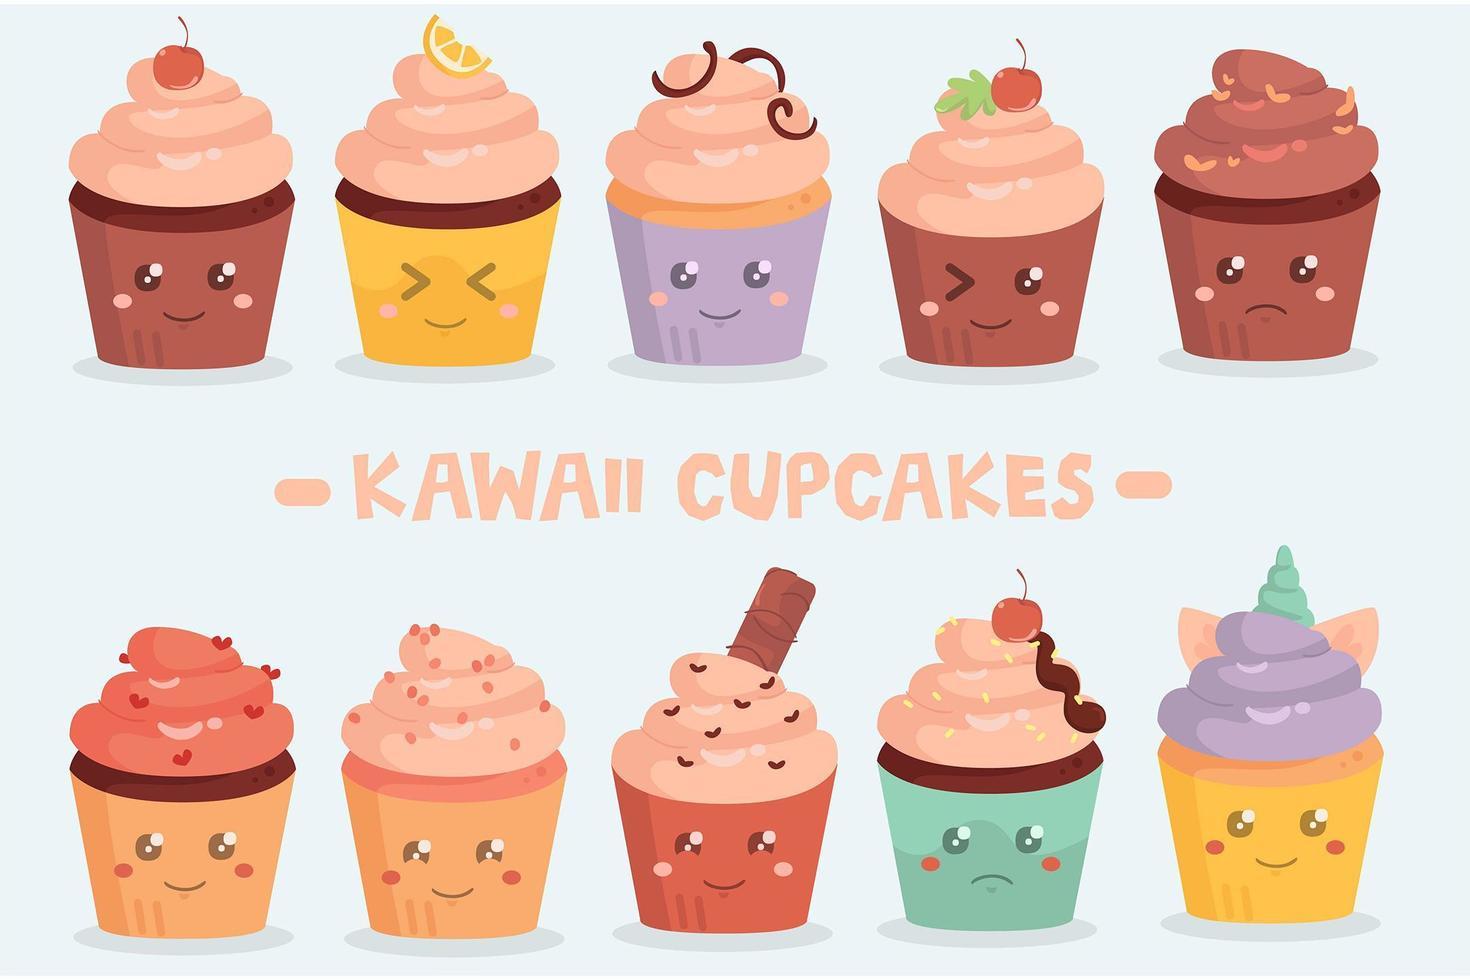 kawaii cupcakes pack vektor